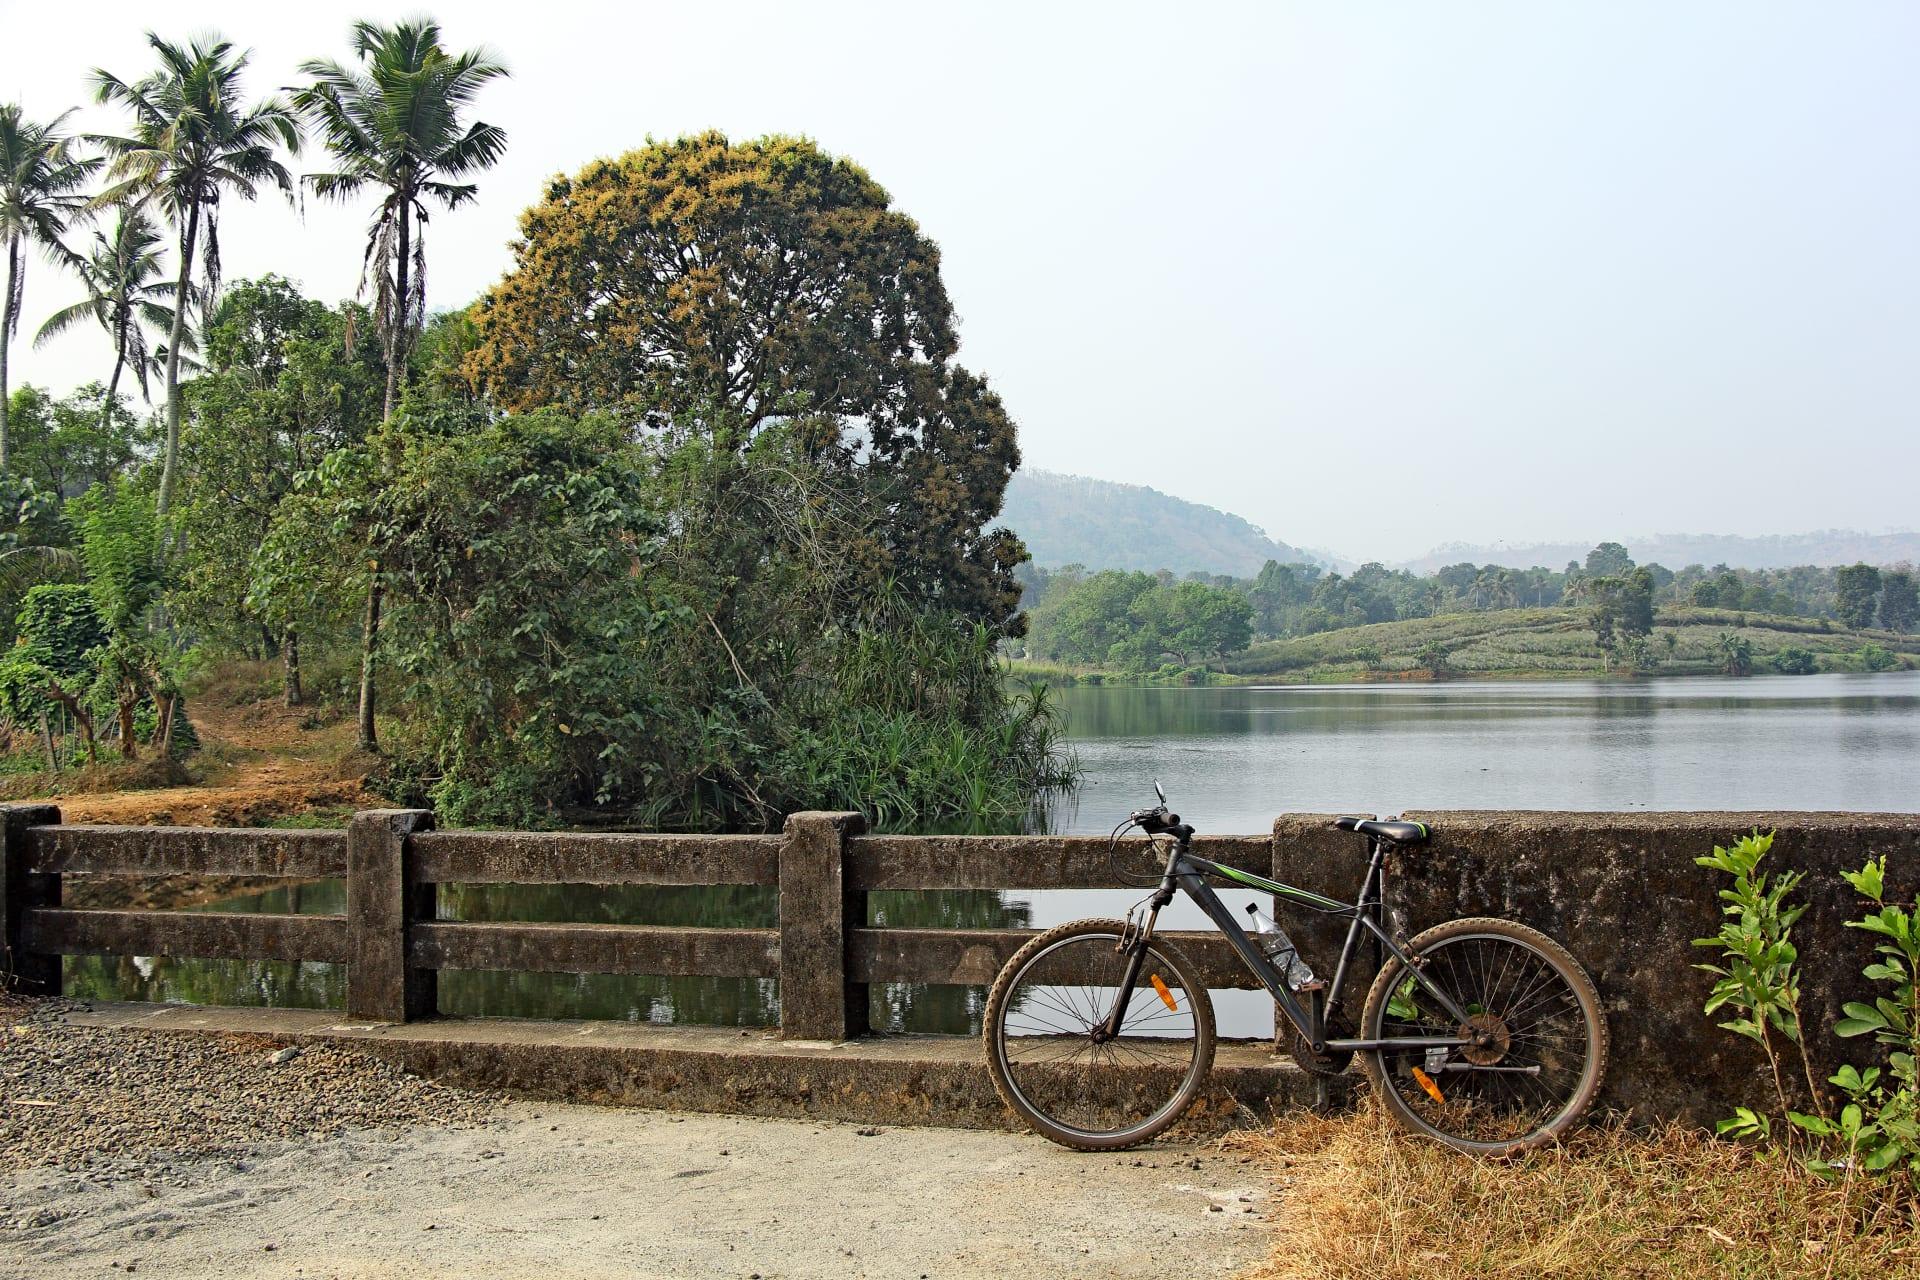 Kerala - Kerala, Annassery - Natural Beauty of a Village (Part 2)